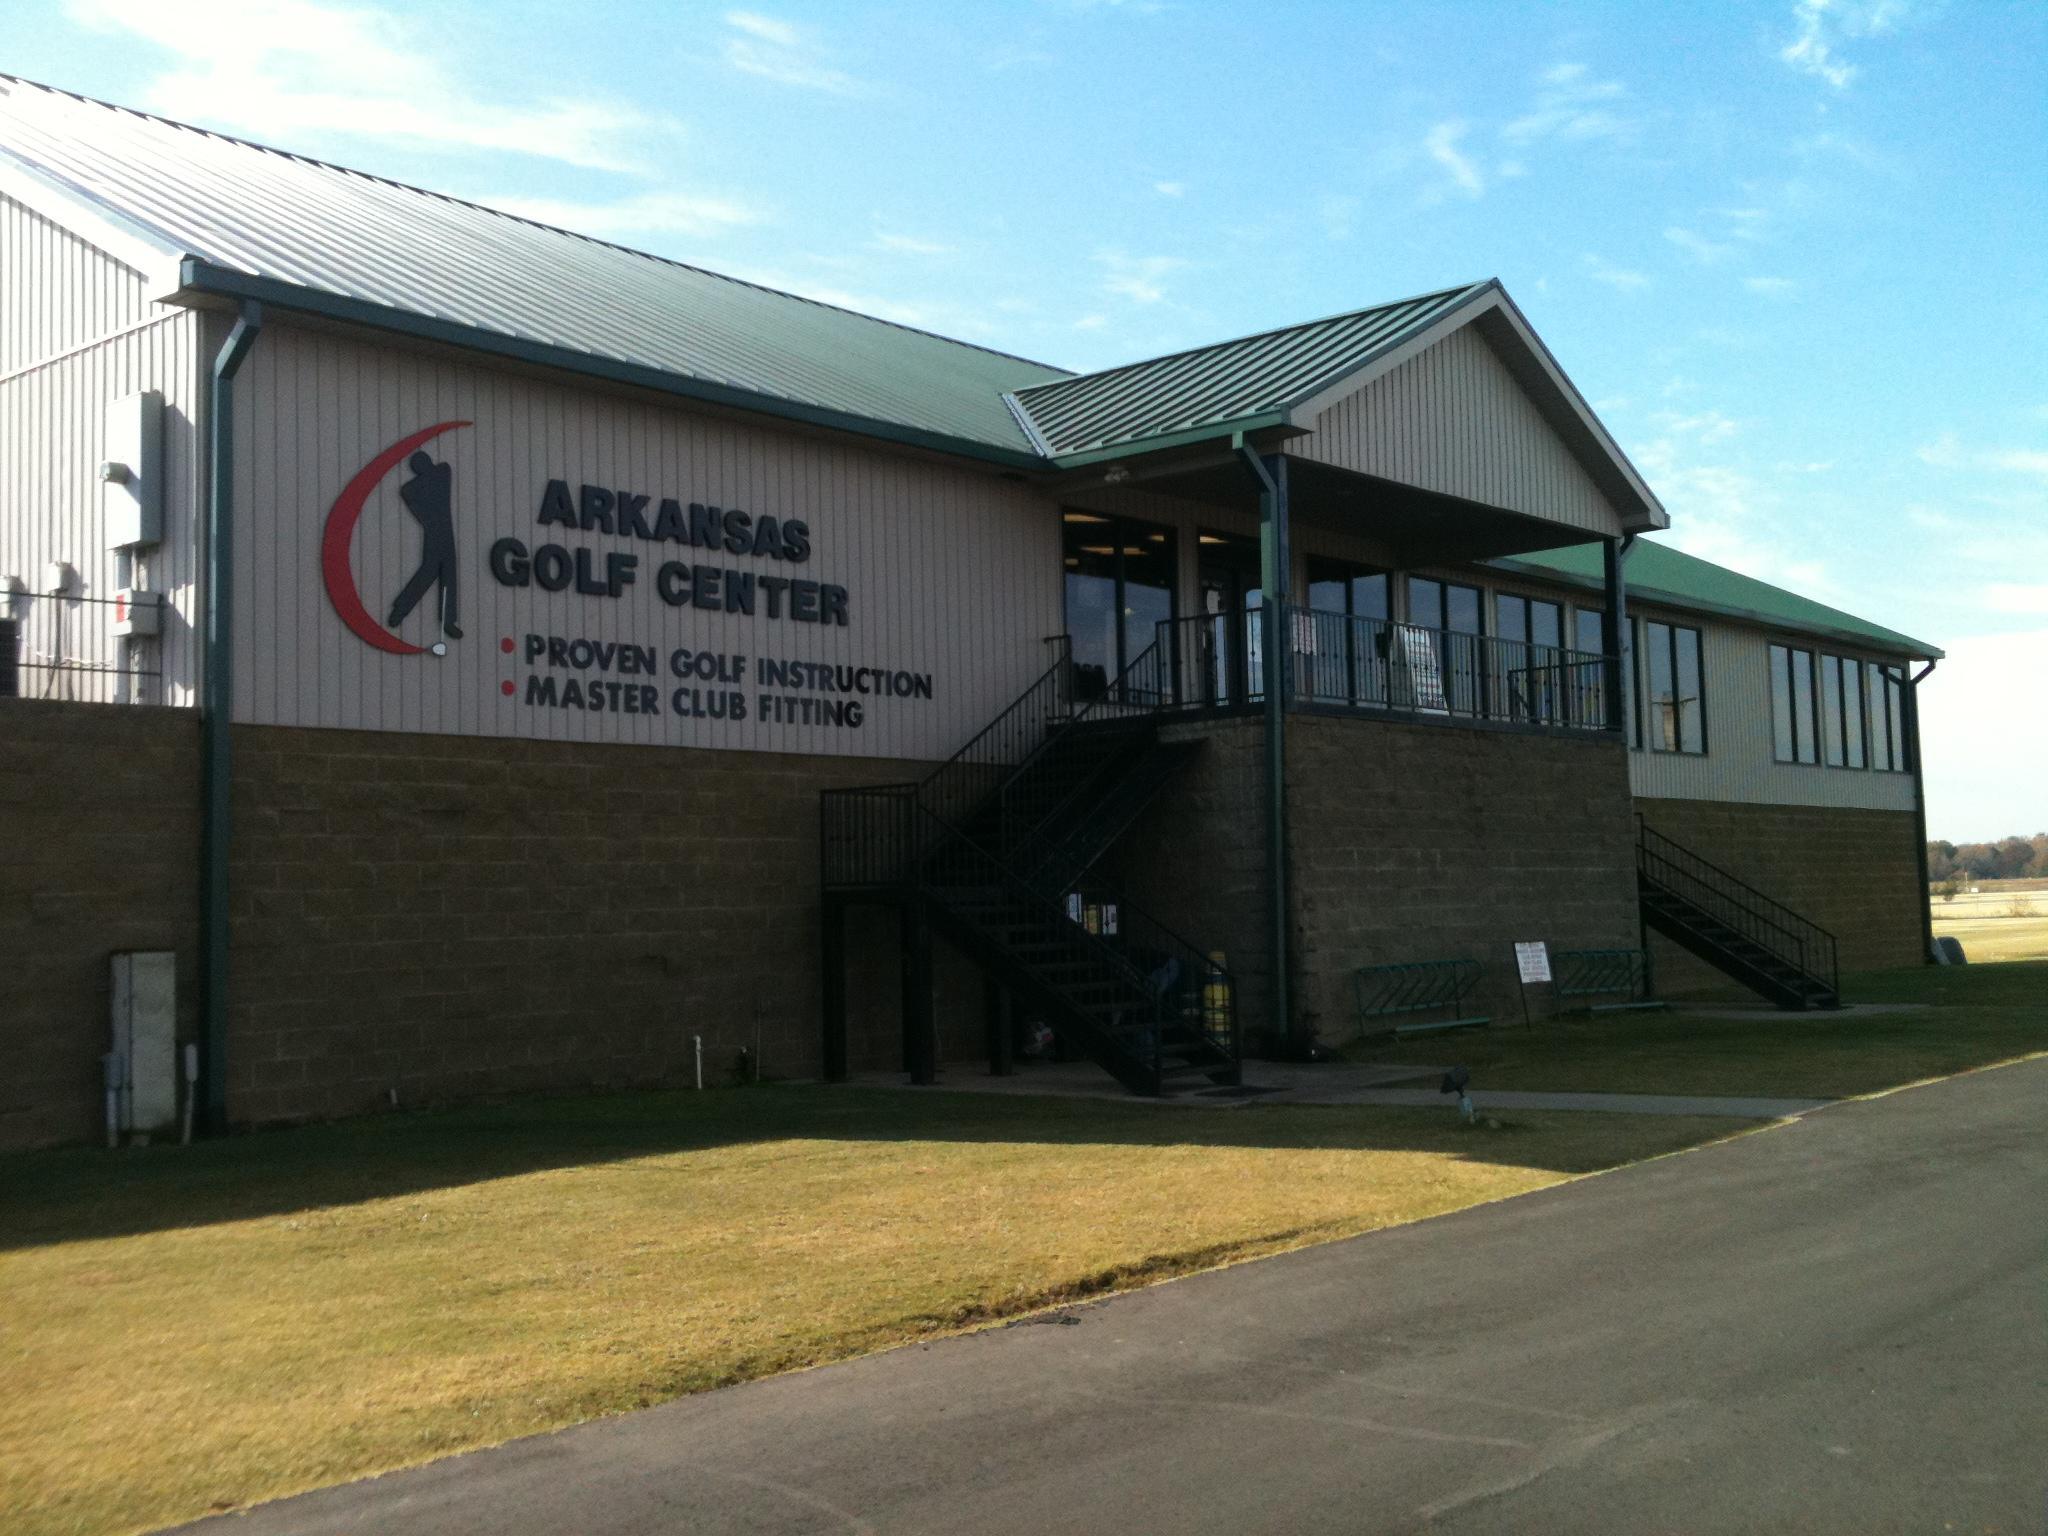 Arkansas Golf Center